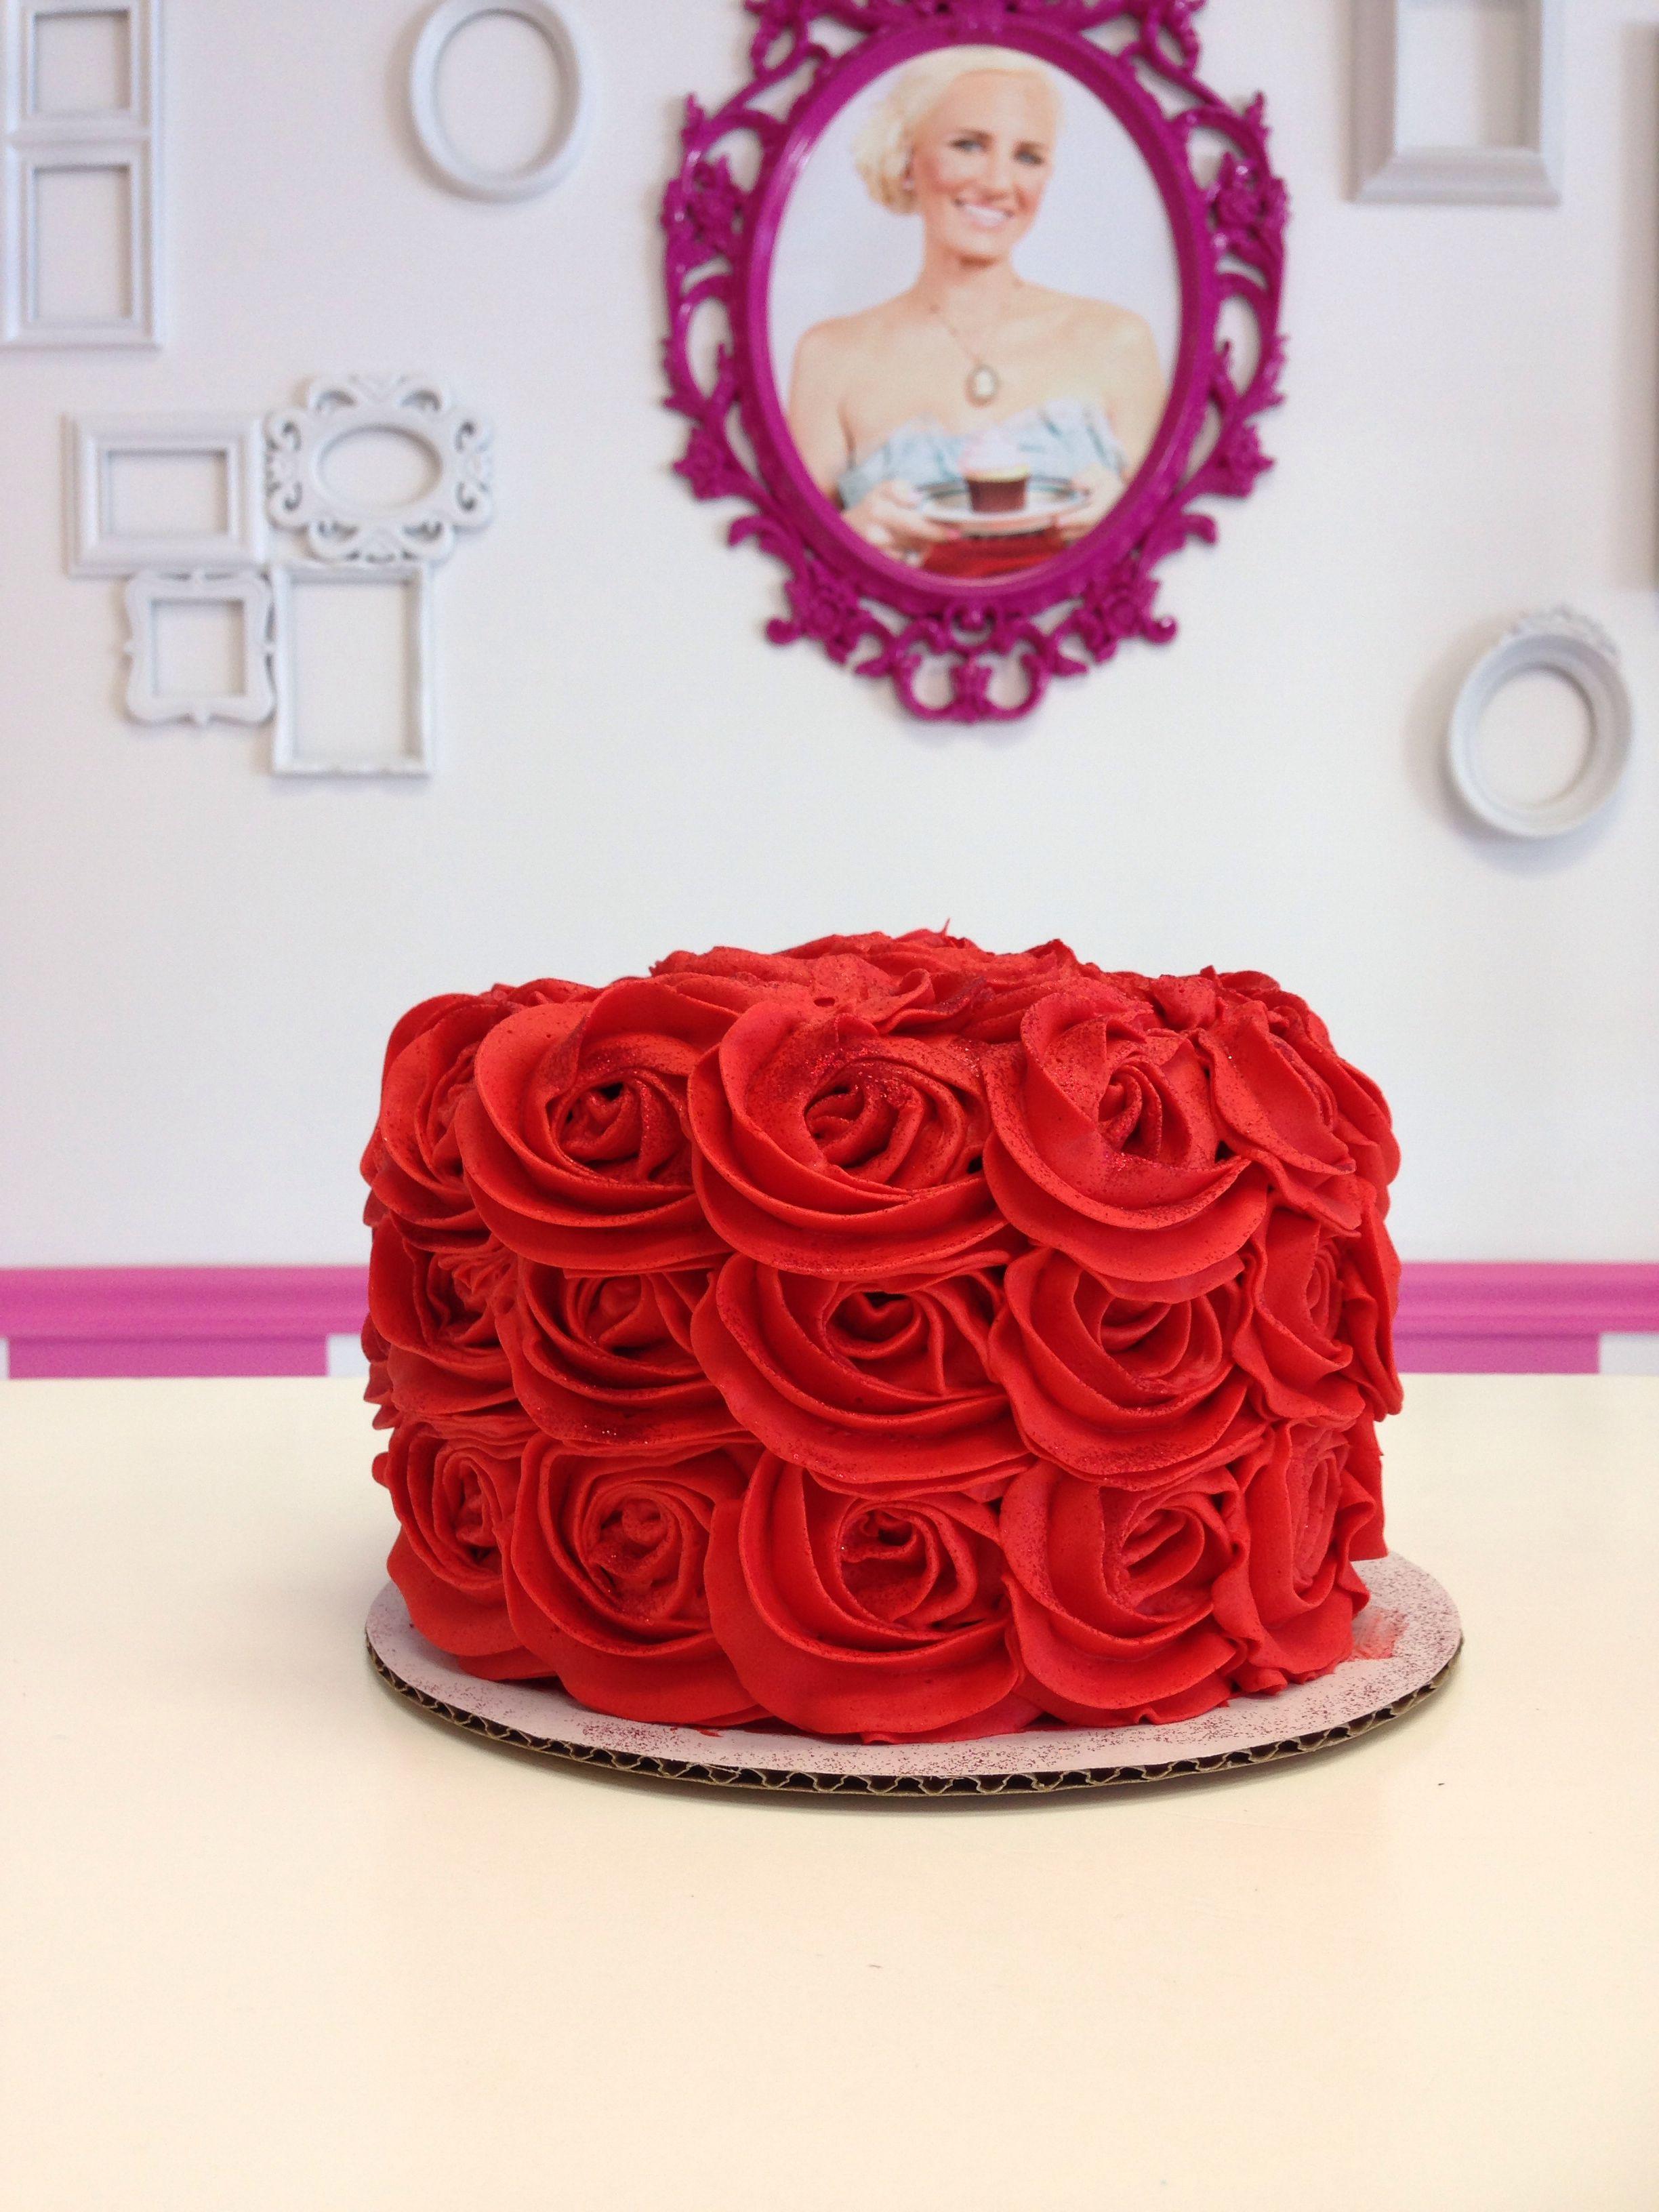 Red Rose Cake By Goodie Girls Elegant Rosette Cake Tea Party Cake